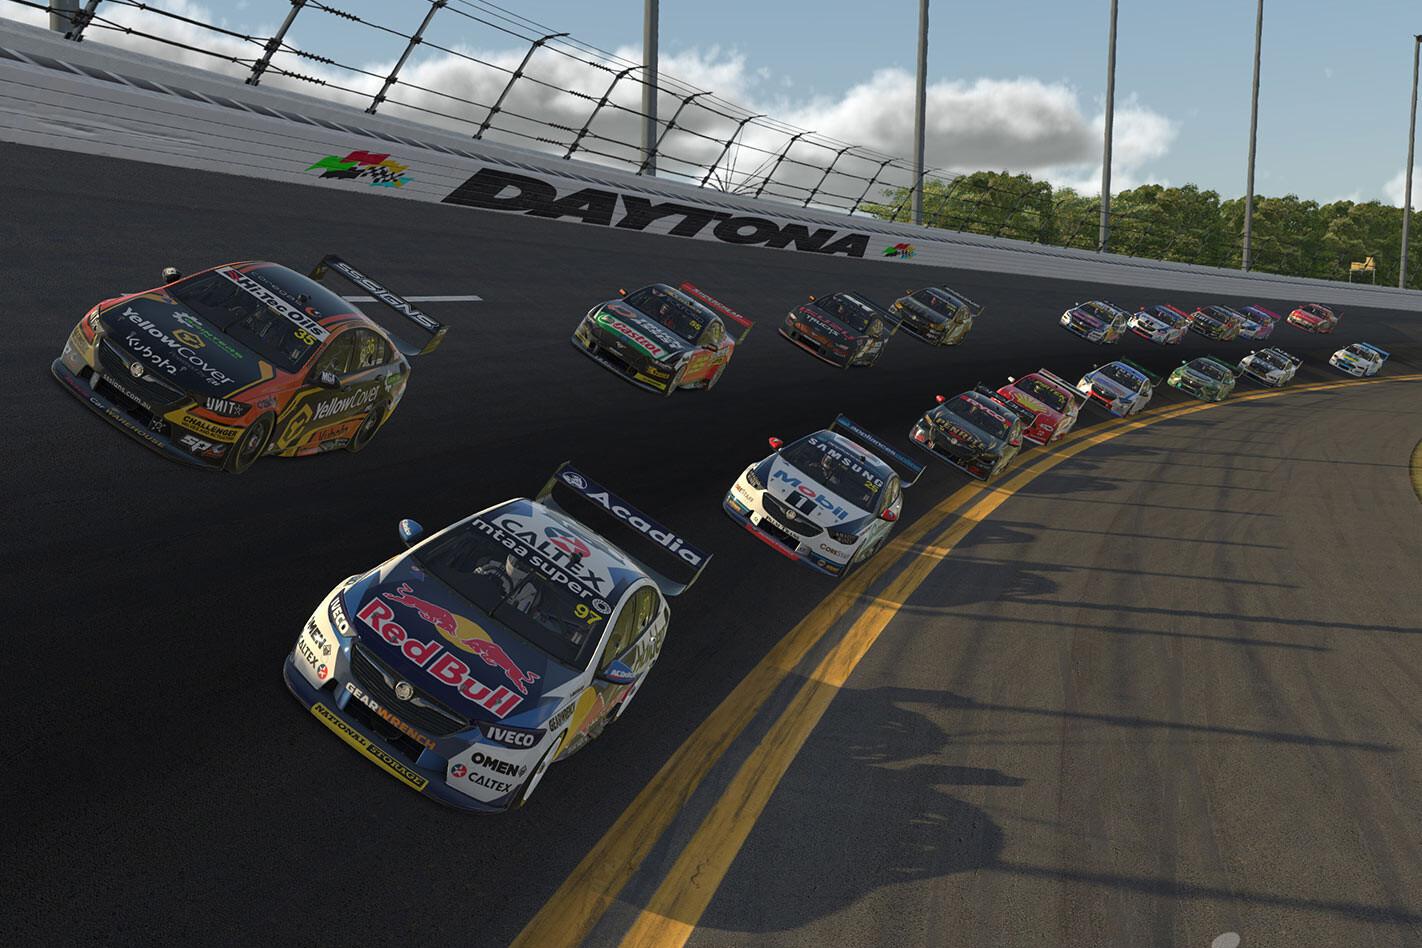 virtual v8 racing